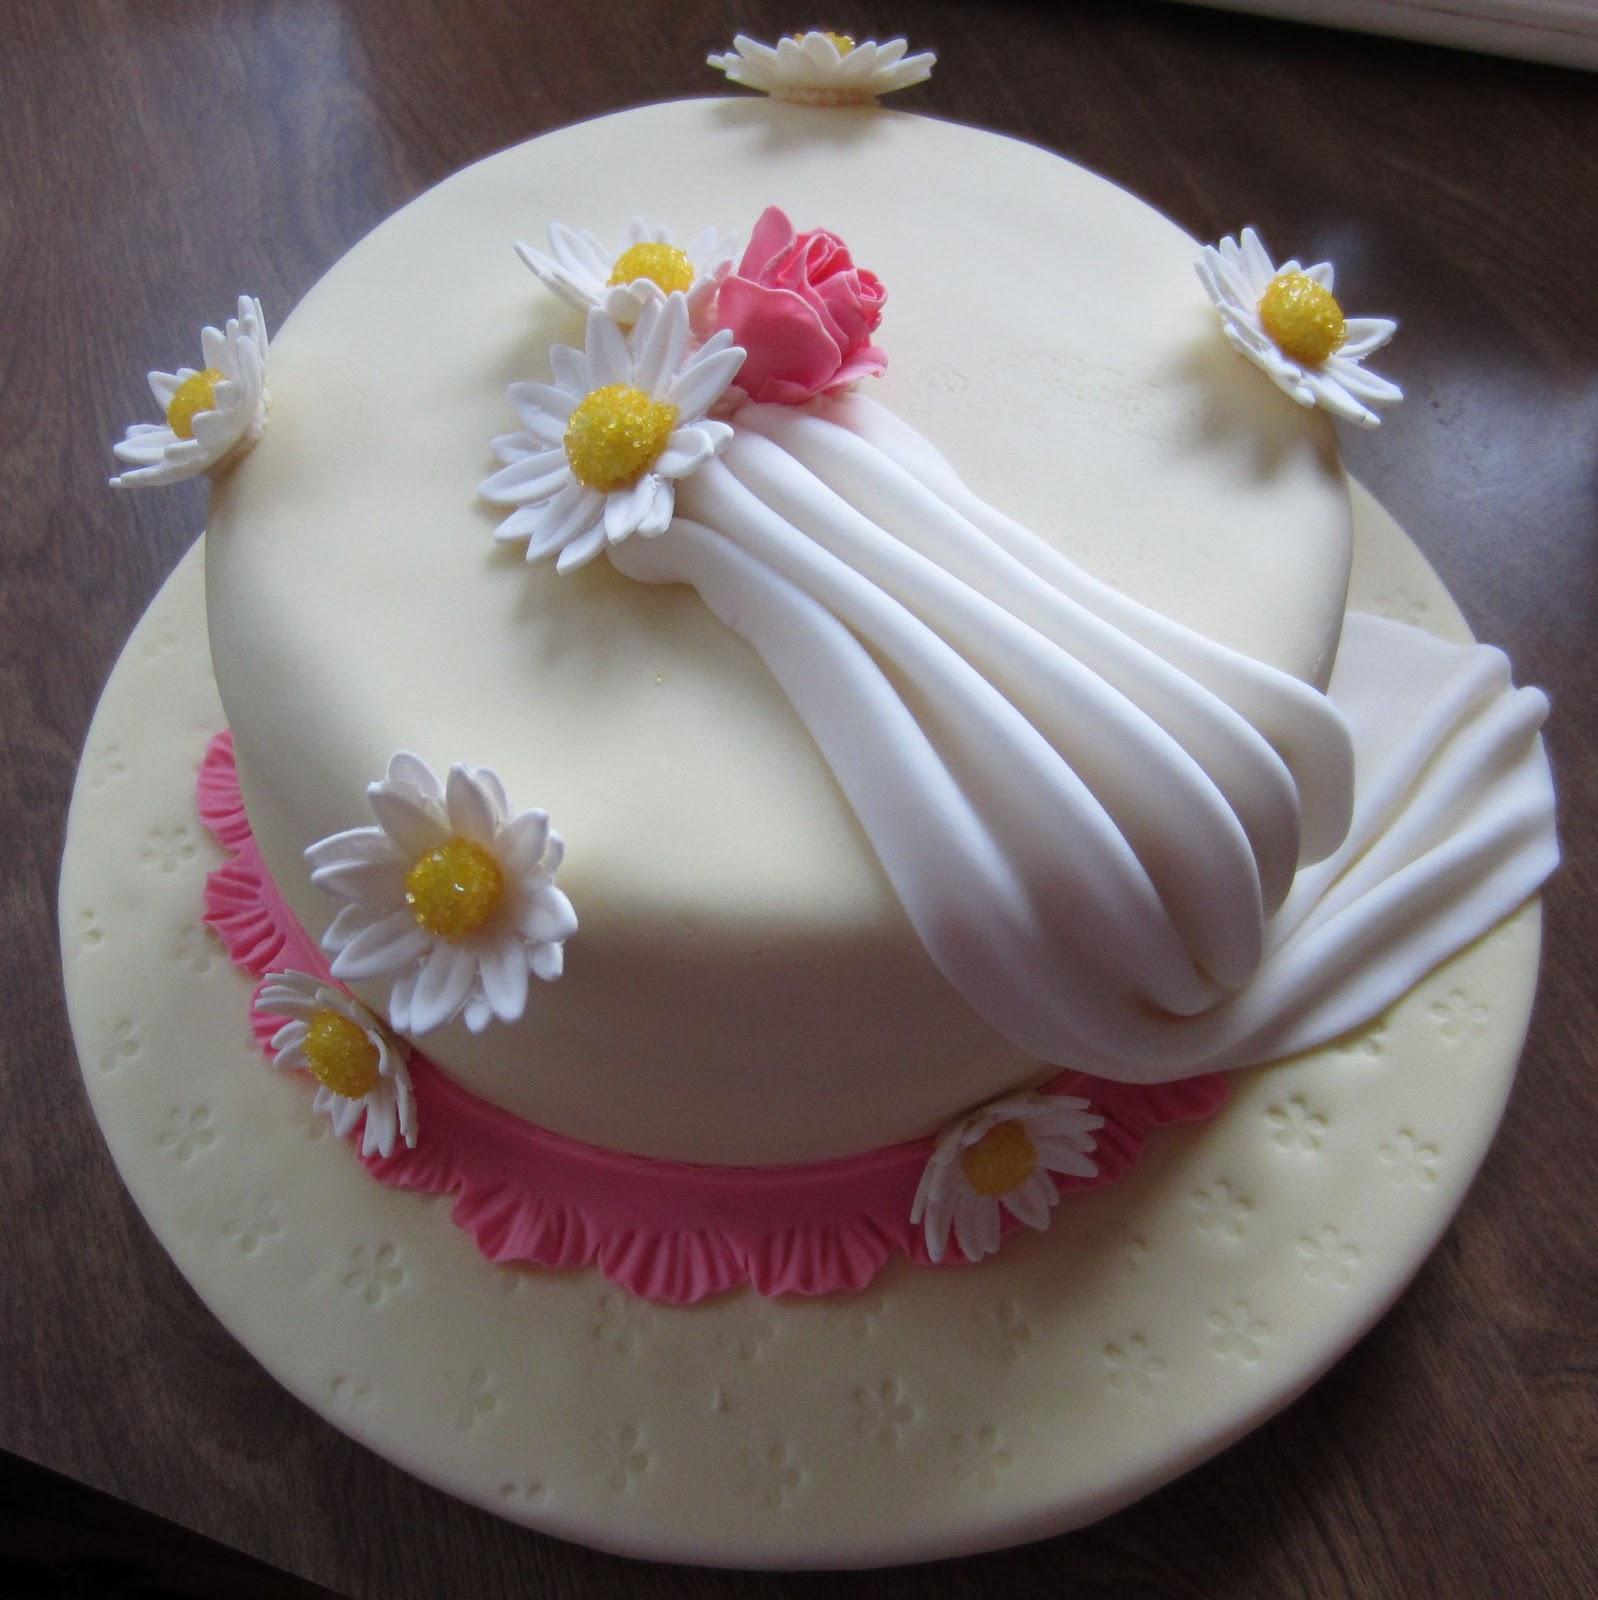 Wilton Cake Fondant Class : Rhapsody of Cacophony: Wilton Course - Final Cake Fondant ...